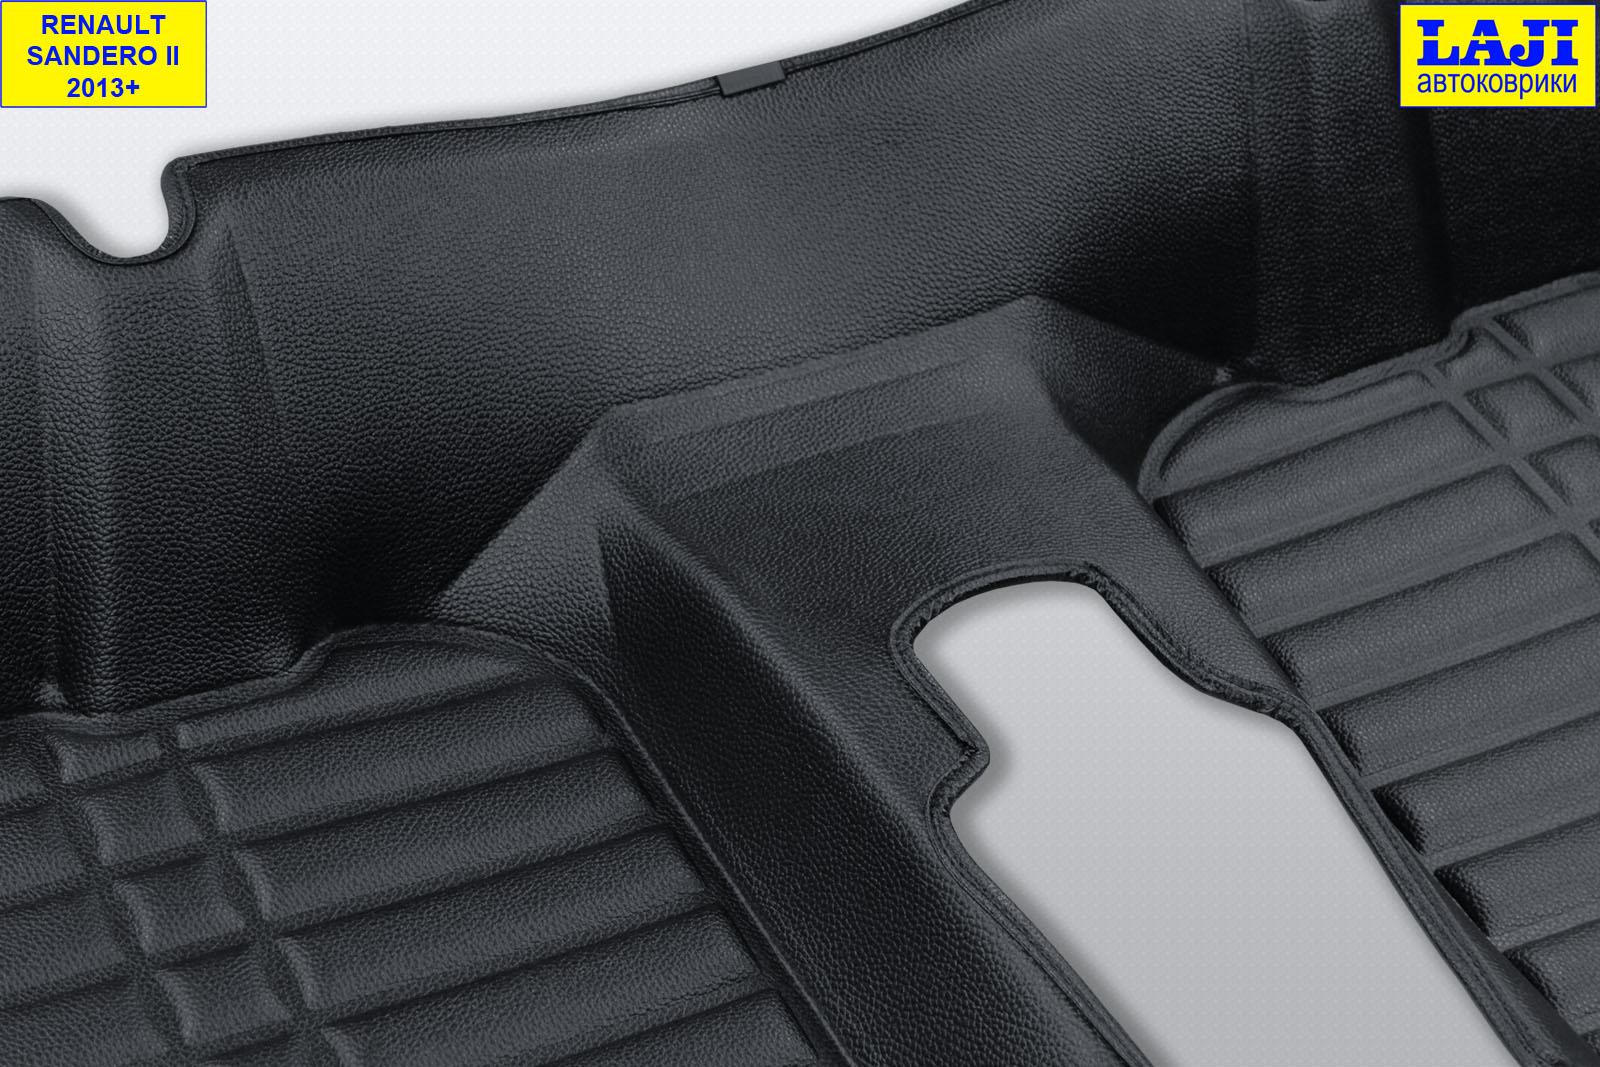 5D коврики в салон Renault Sandero 2 2014-н.в. 11